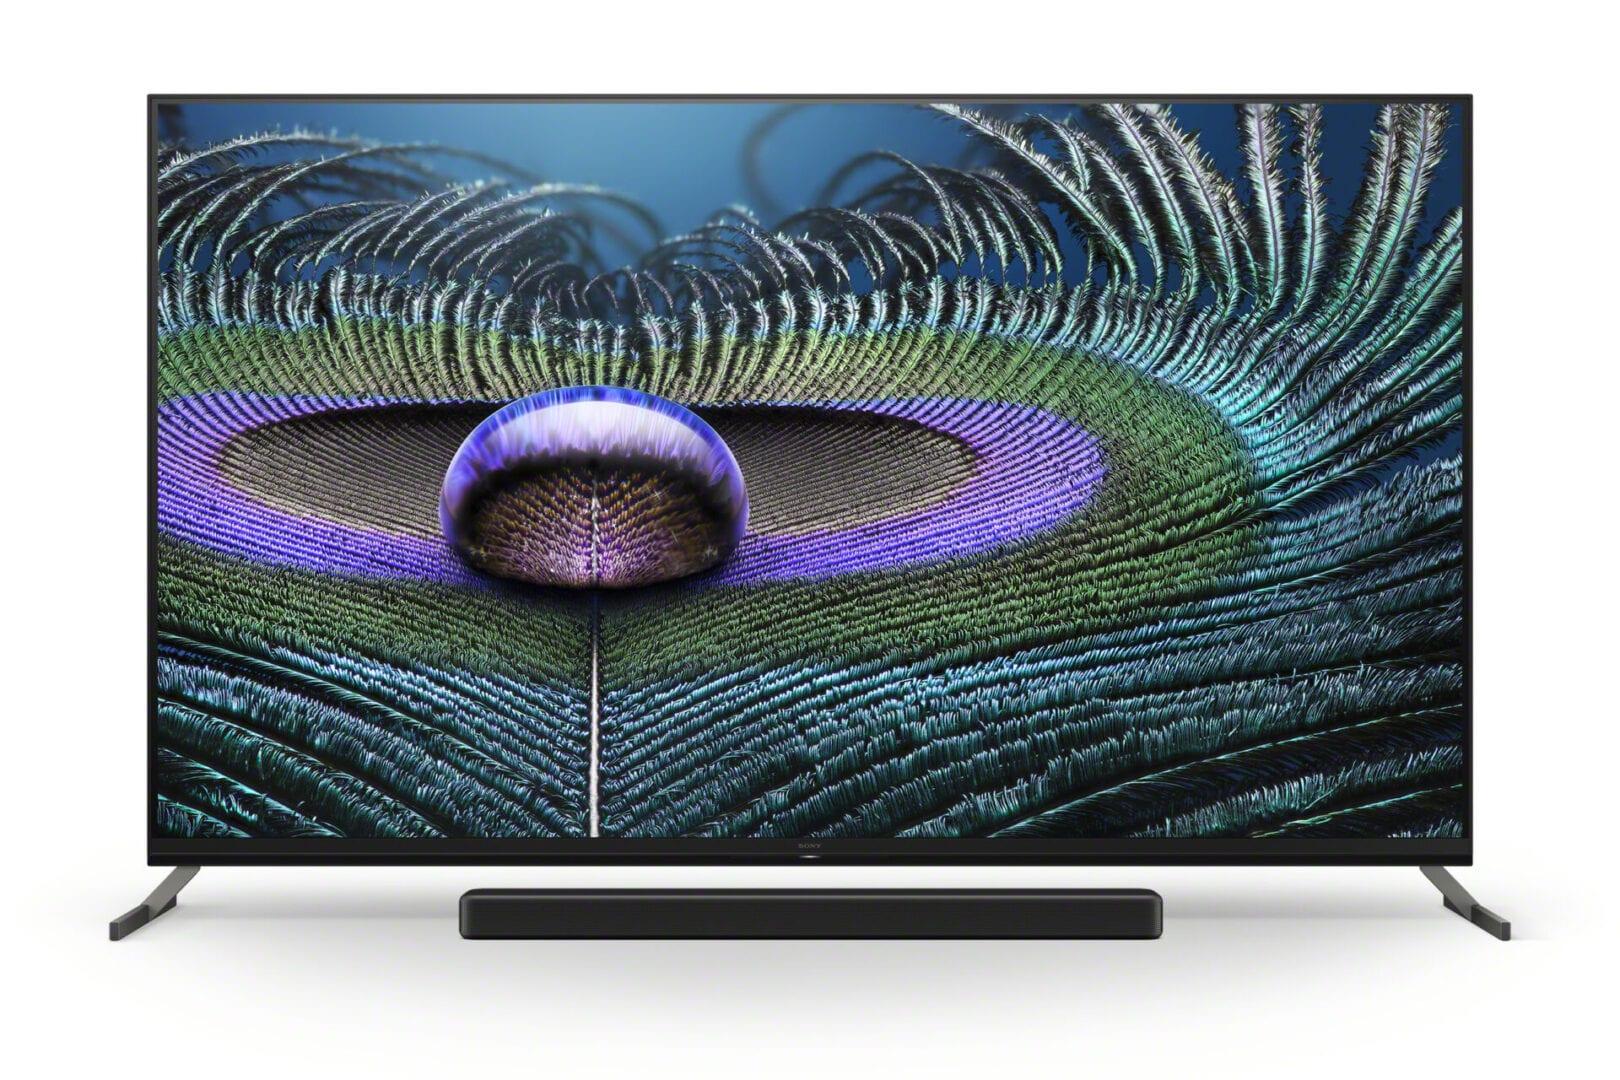 CES 2021 – Όλες οι νέες σειρές τηλεοράσεων της Sony σε βίντεο